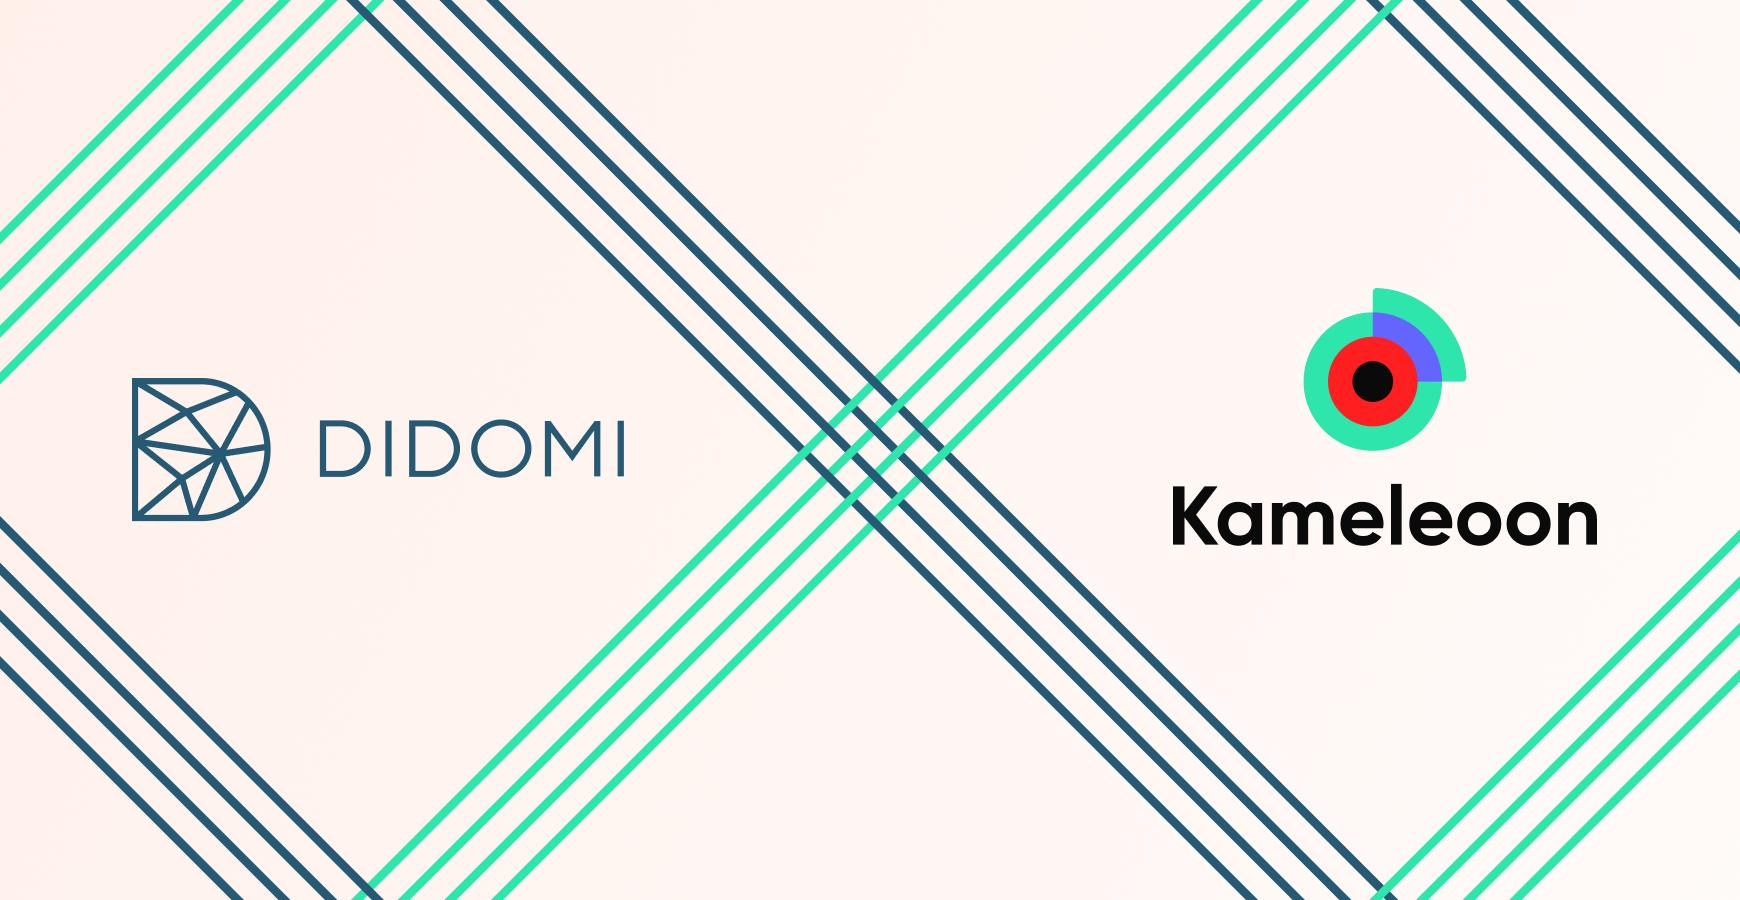 Didomi x Kameleoon intégration